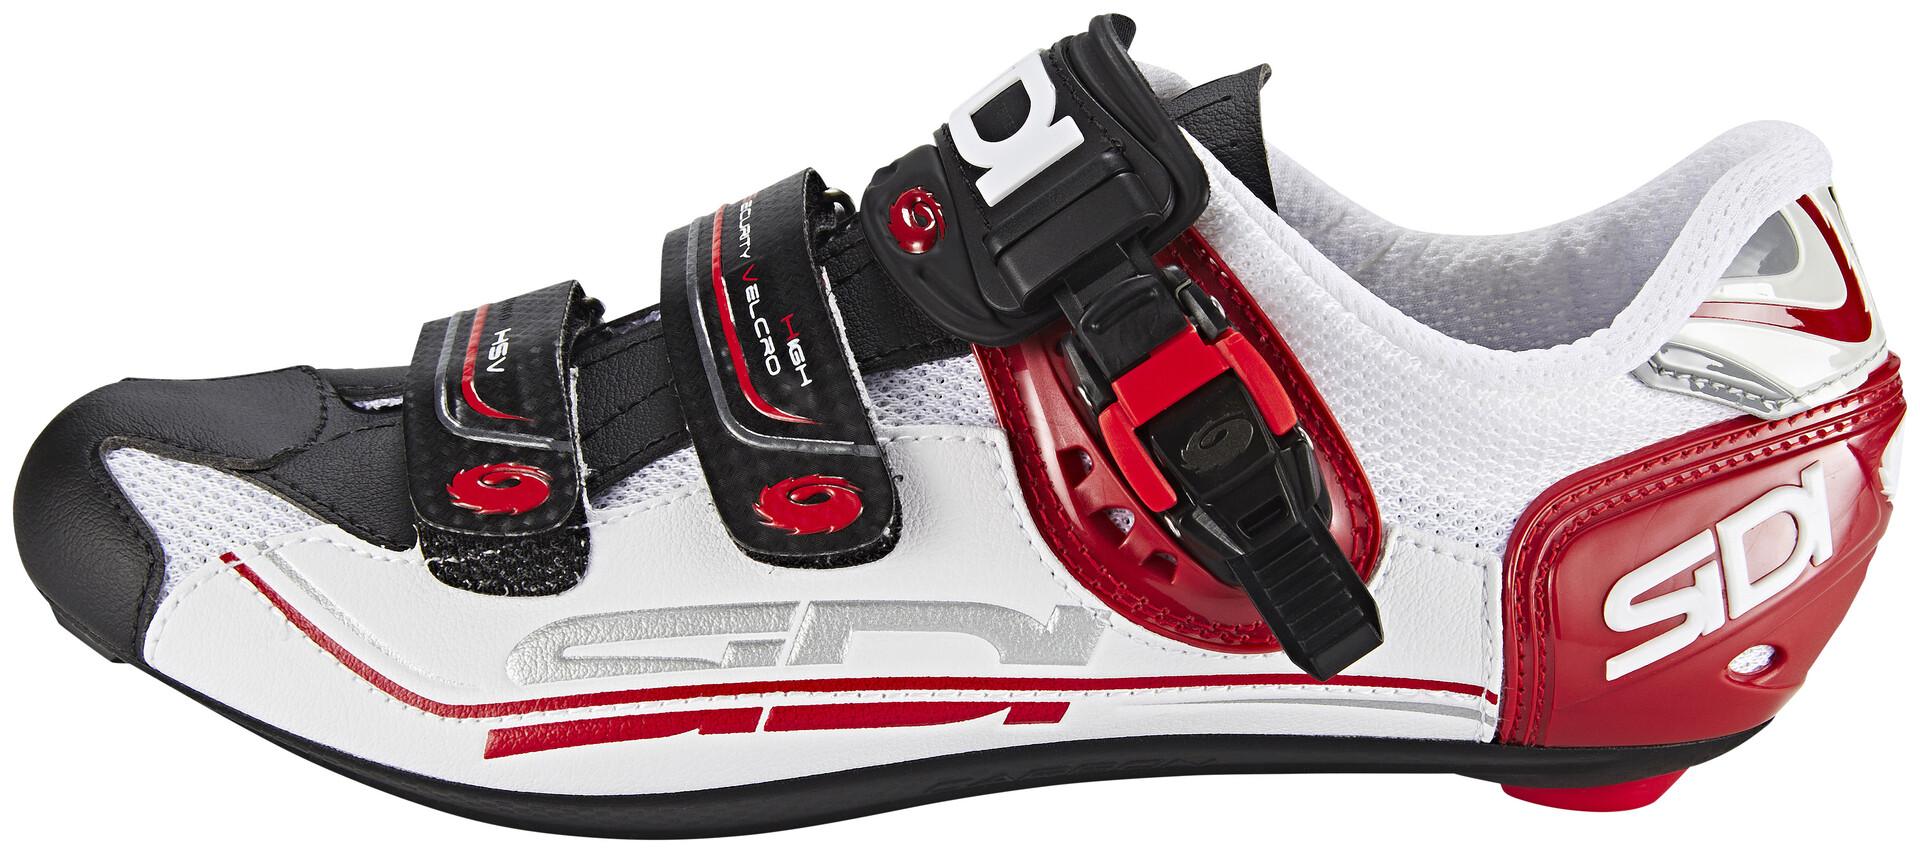 Sidi Genius 7 Chaussures Homme, whiteblackred Boutique